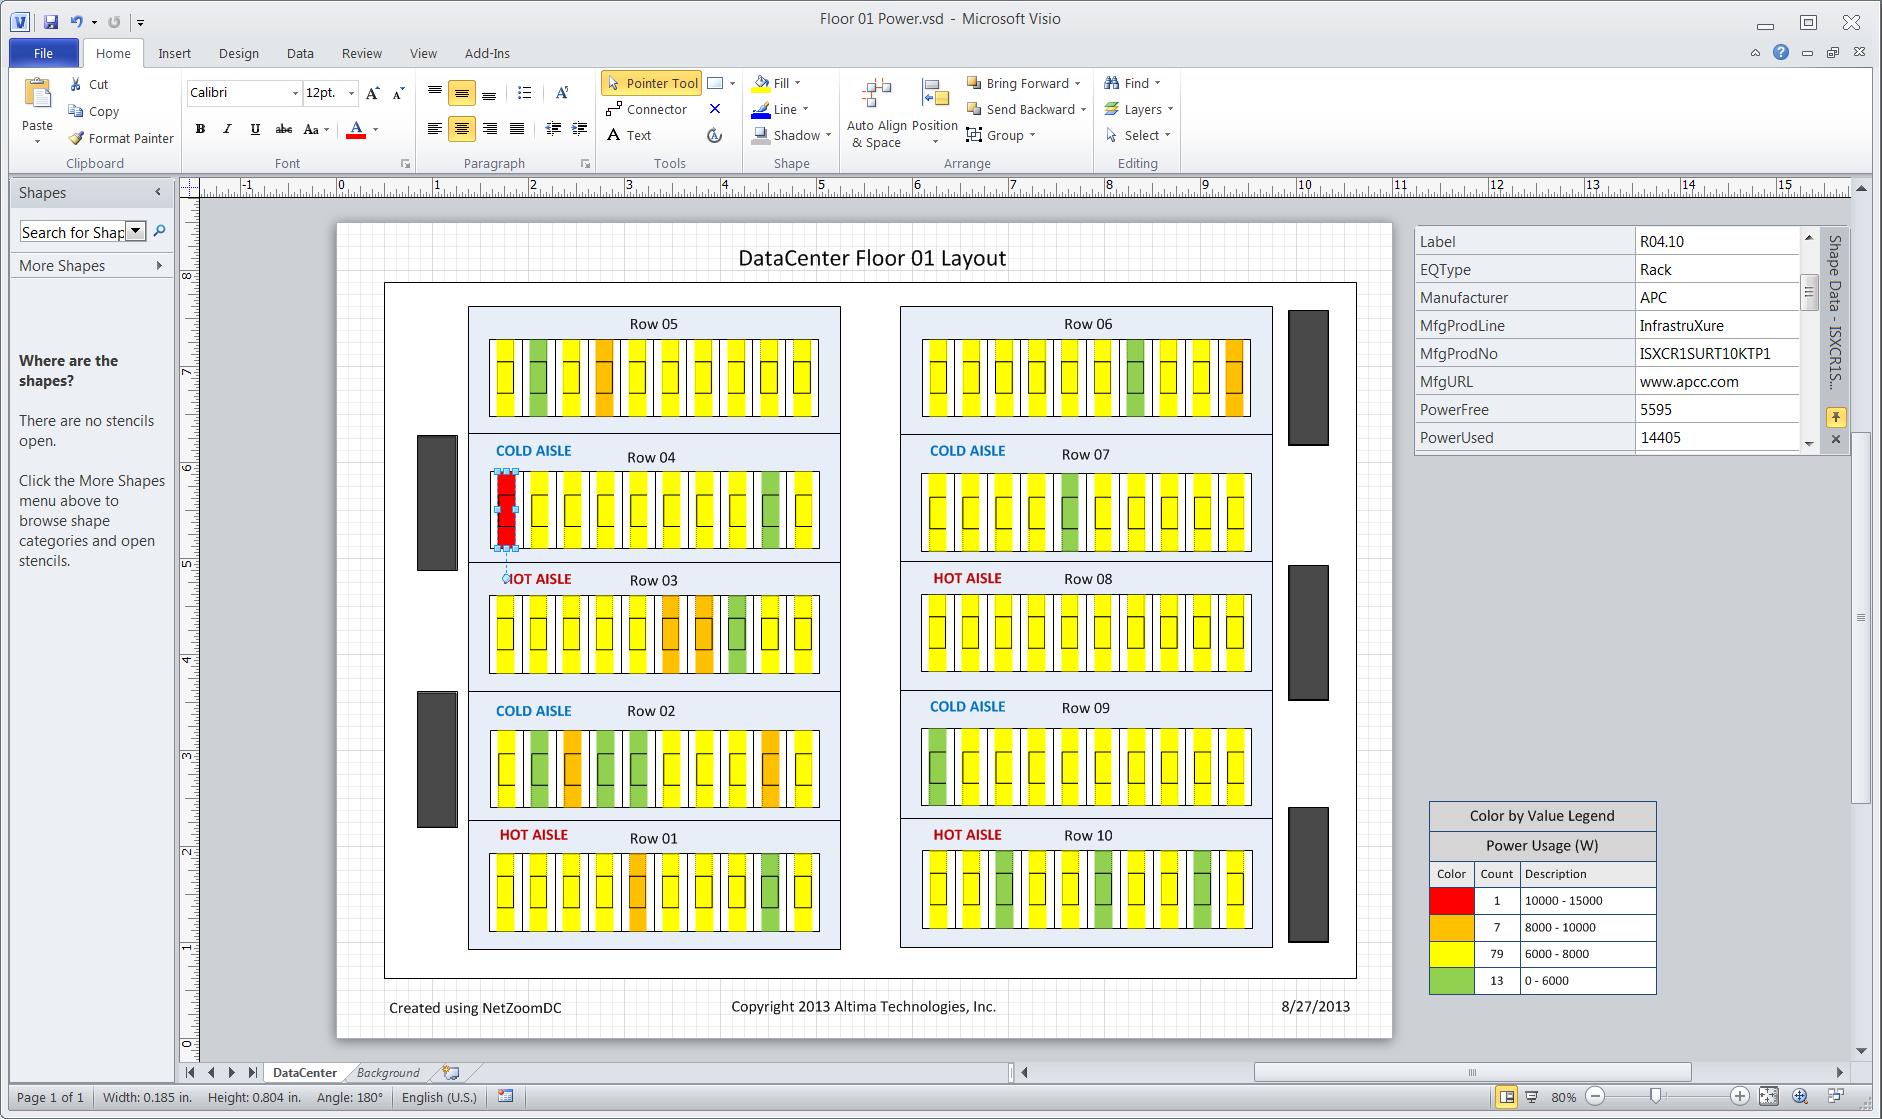 Altima Technologies Showcases Netzoomdc U2122 Dcim And